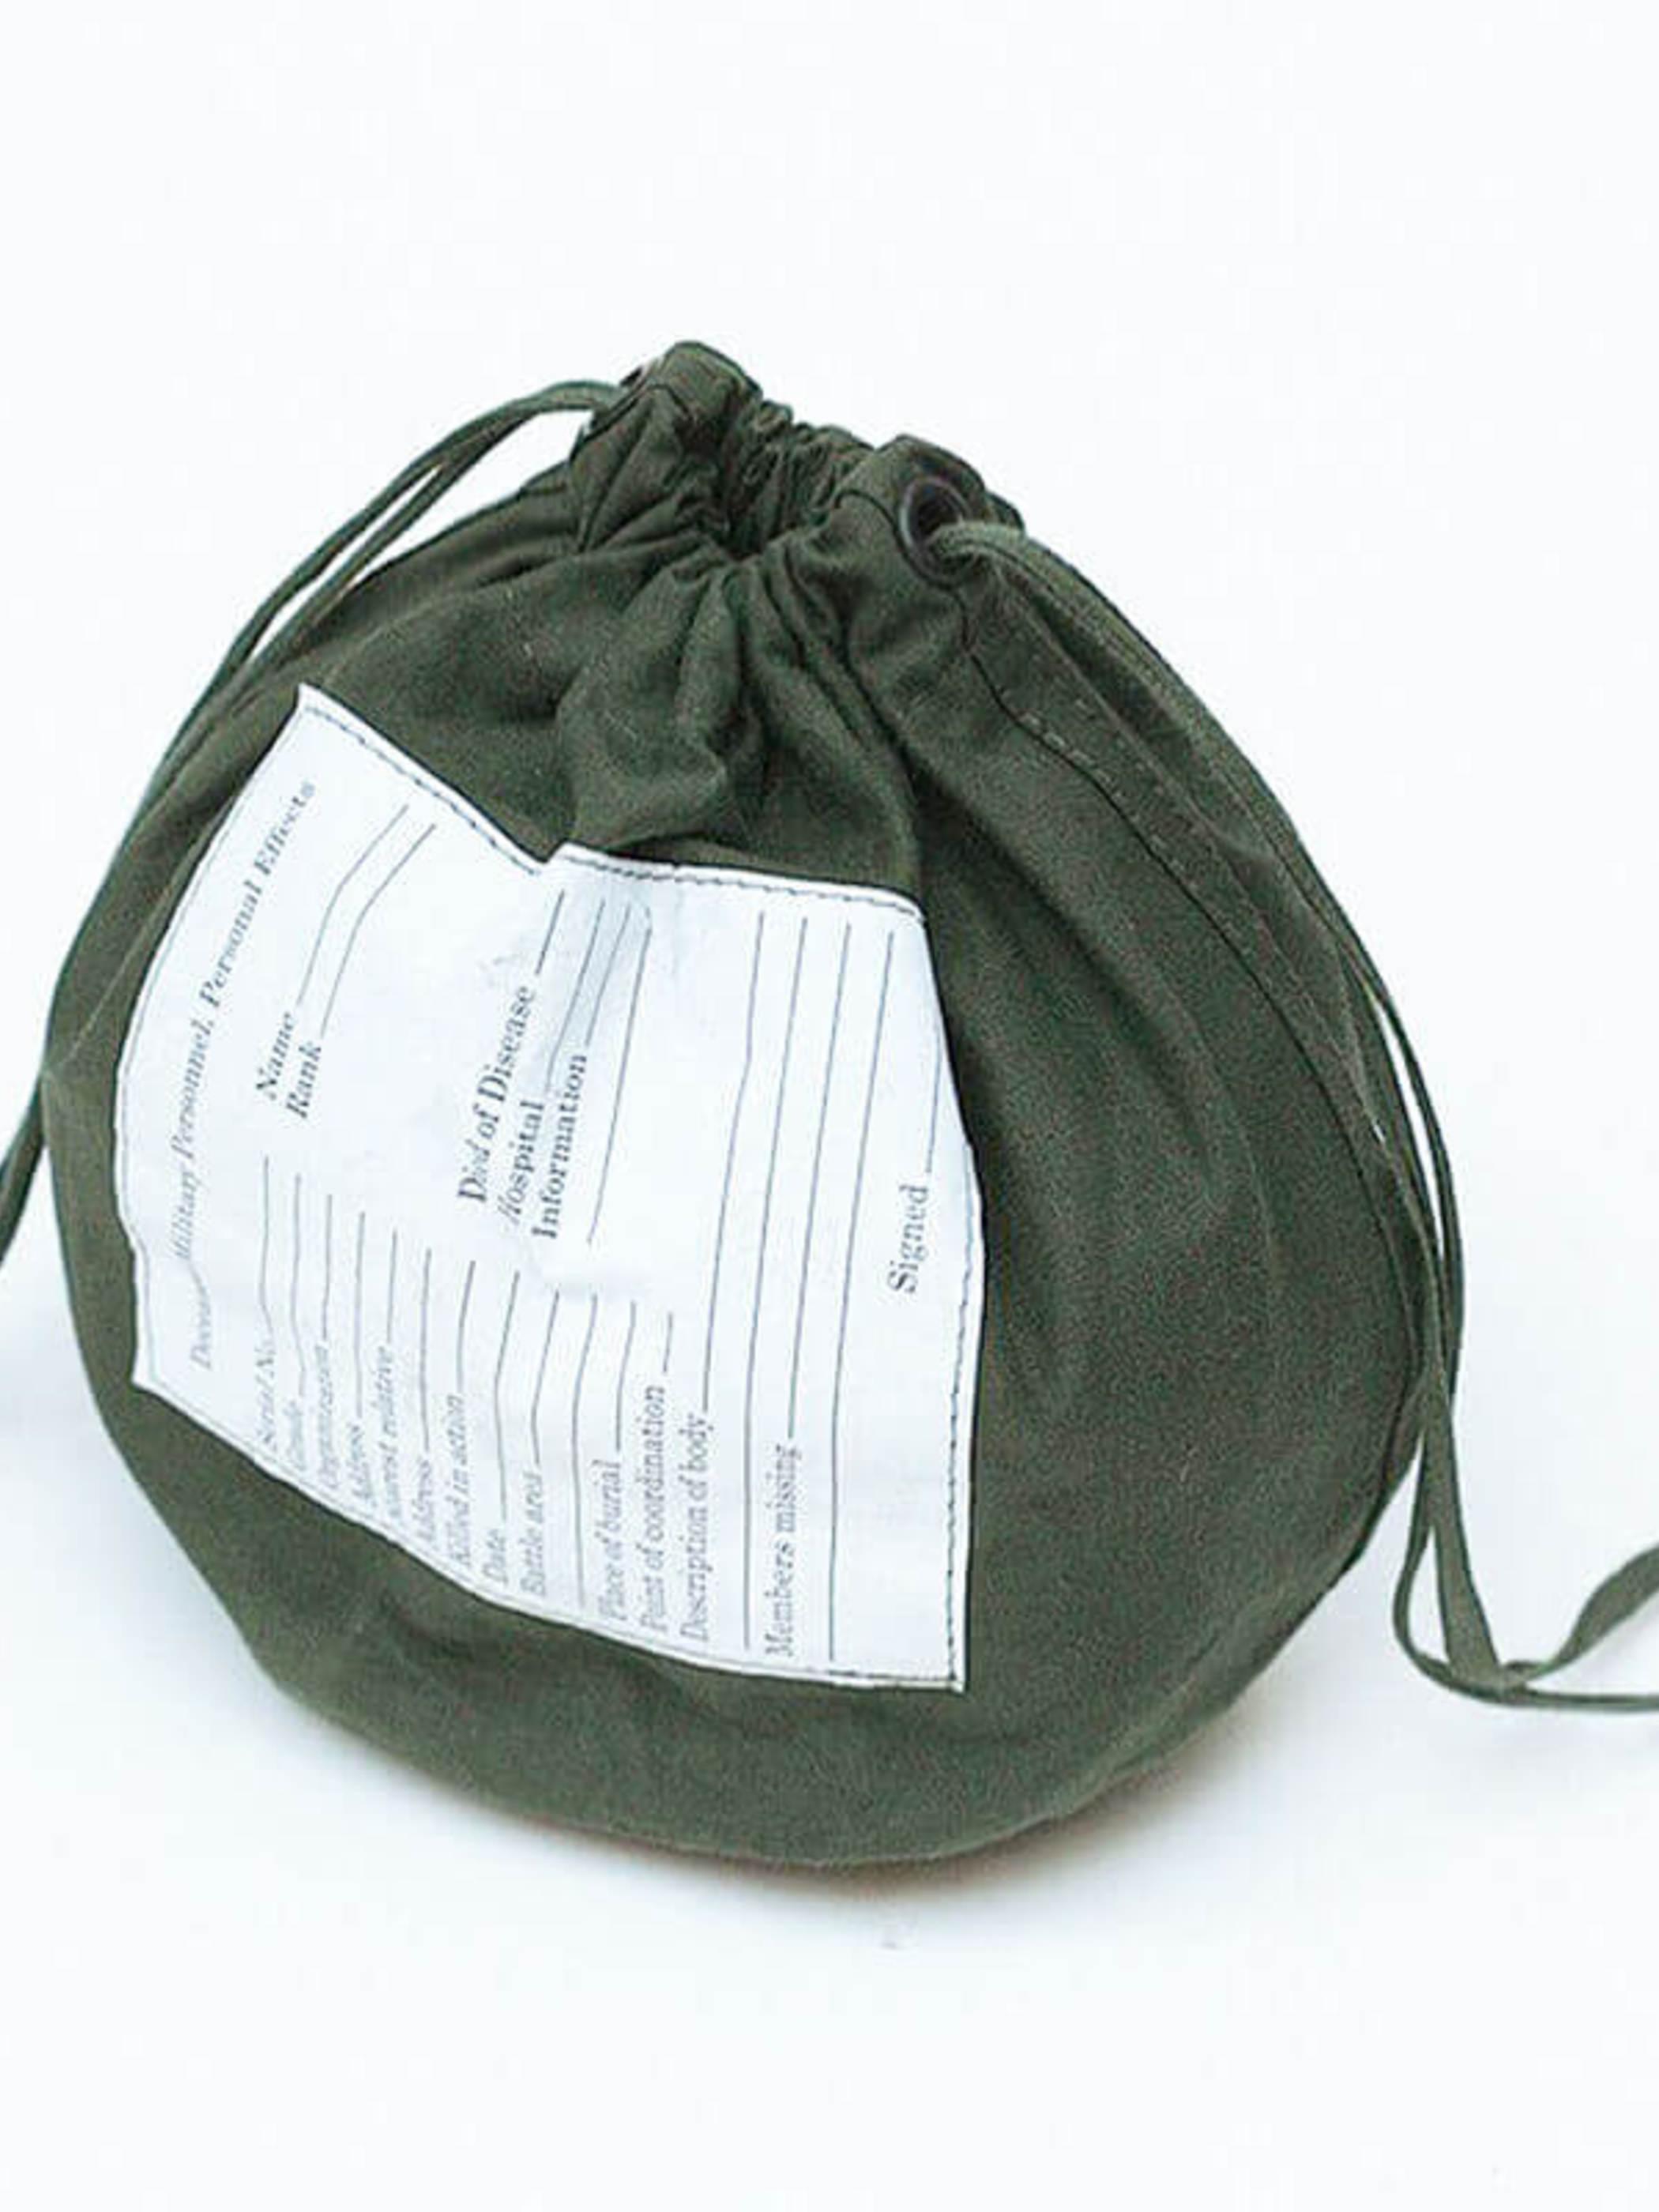 US Military / 1980'sDeadstock / Cotton Bag